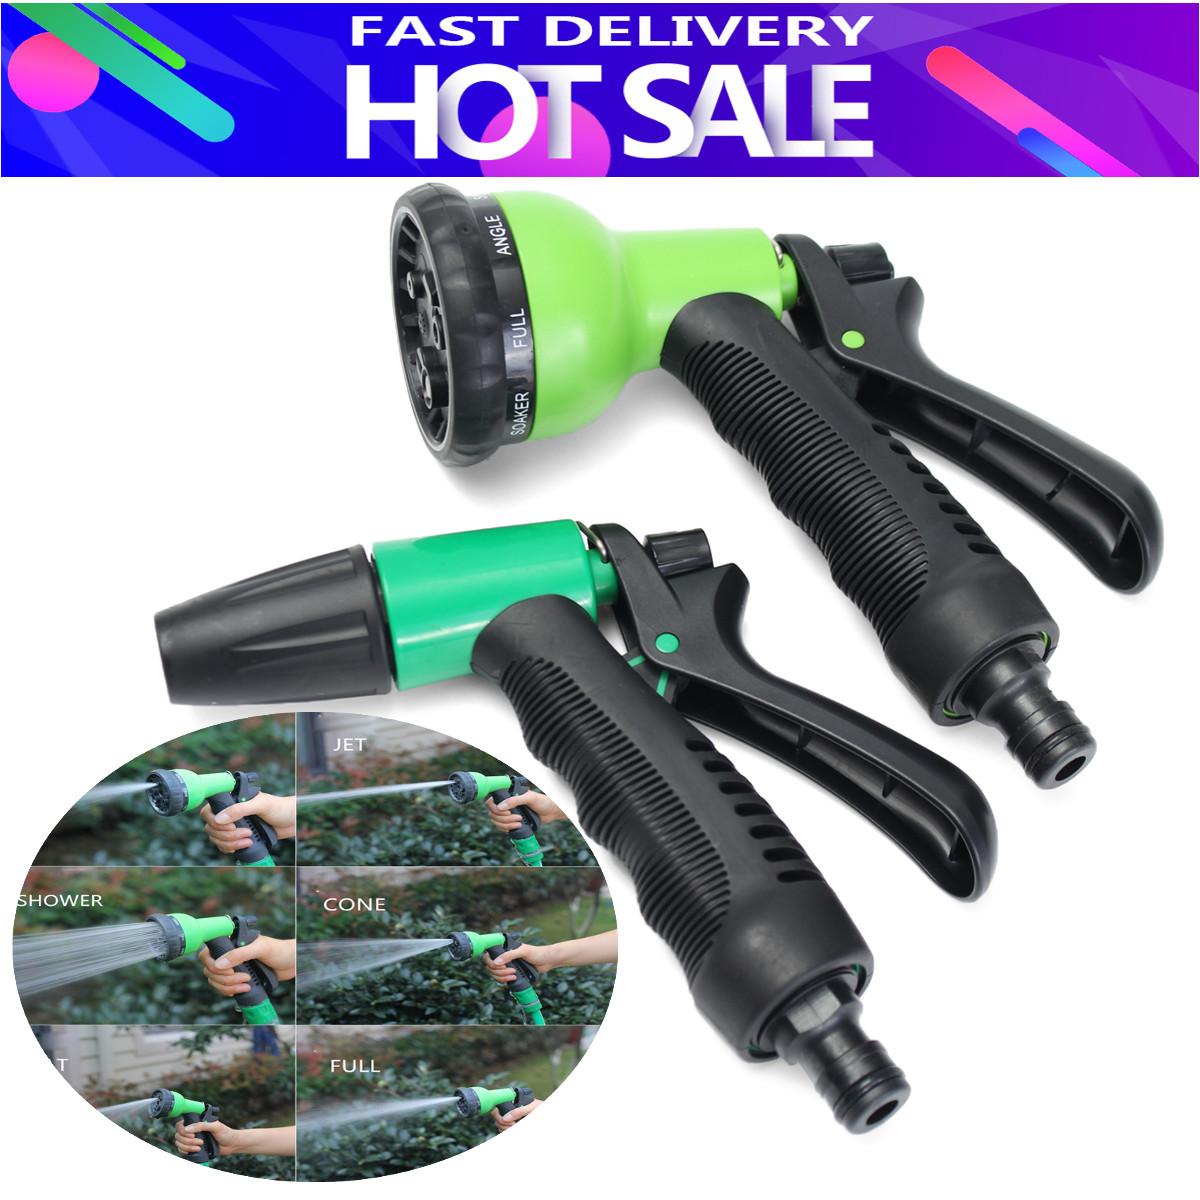 Garden Water Sprayer Hose Irrigation Soft Grip Nozzle 8 Spray Settings Car Washing- 2 Pack